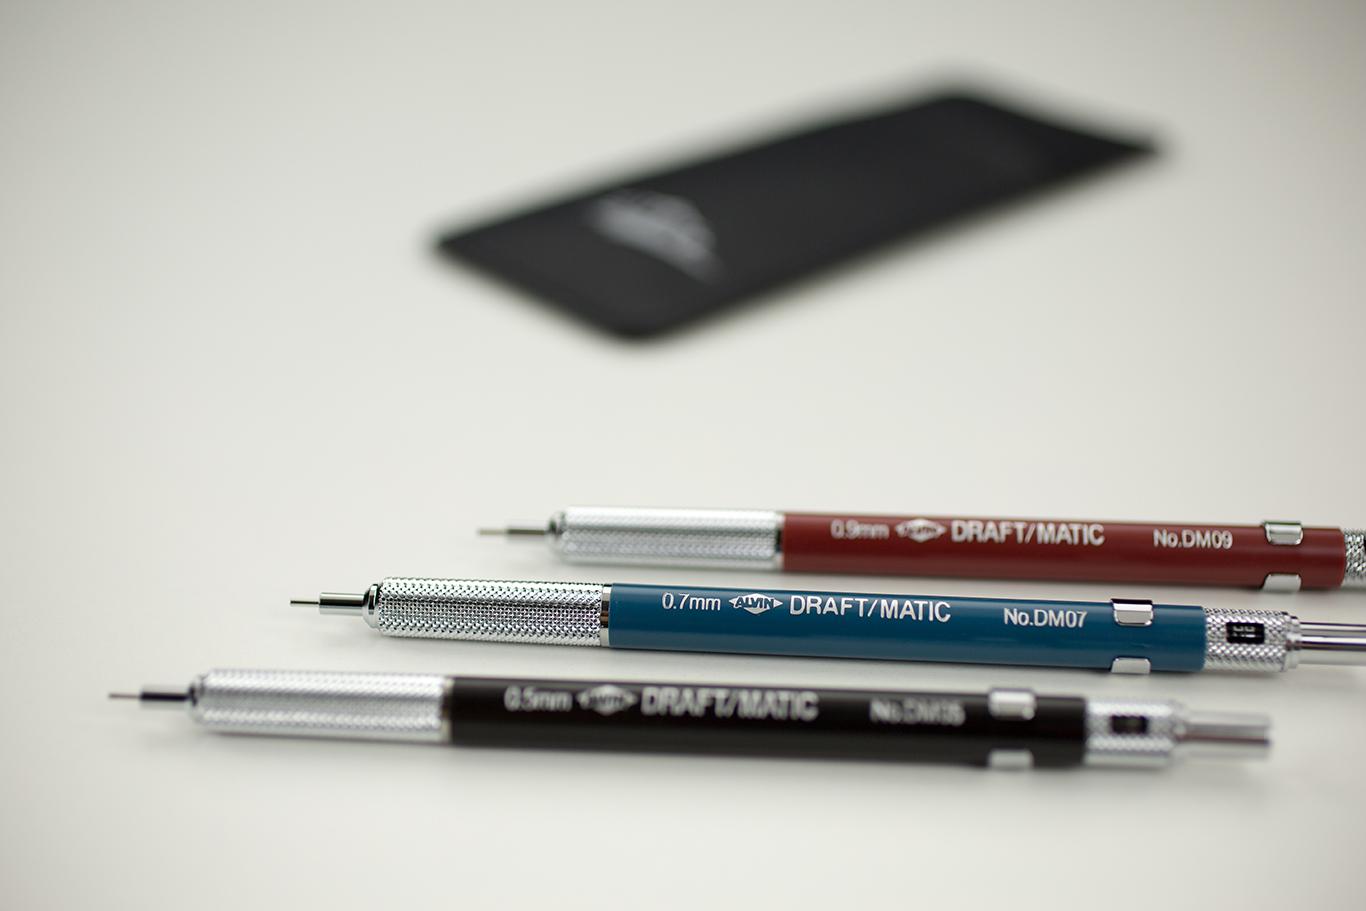 Alvin® Draft-Matic Mechanical Pencil Set of 3 Item No. DM579C